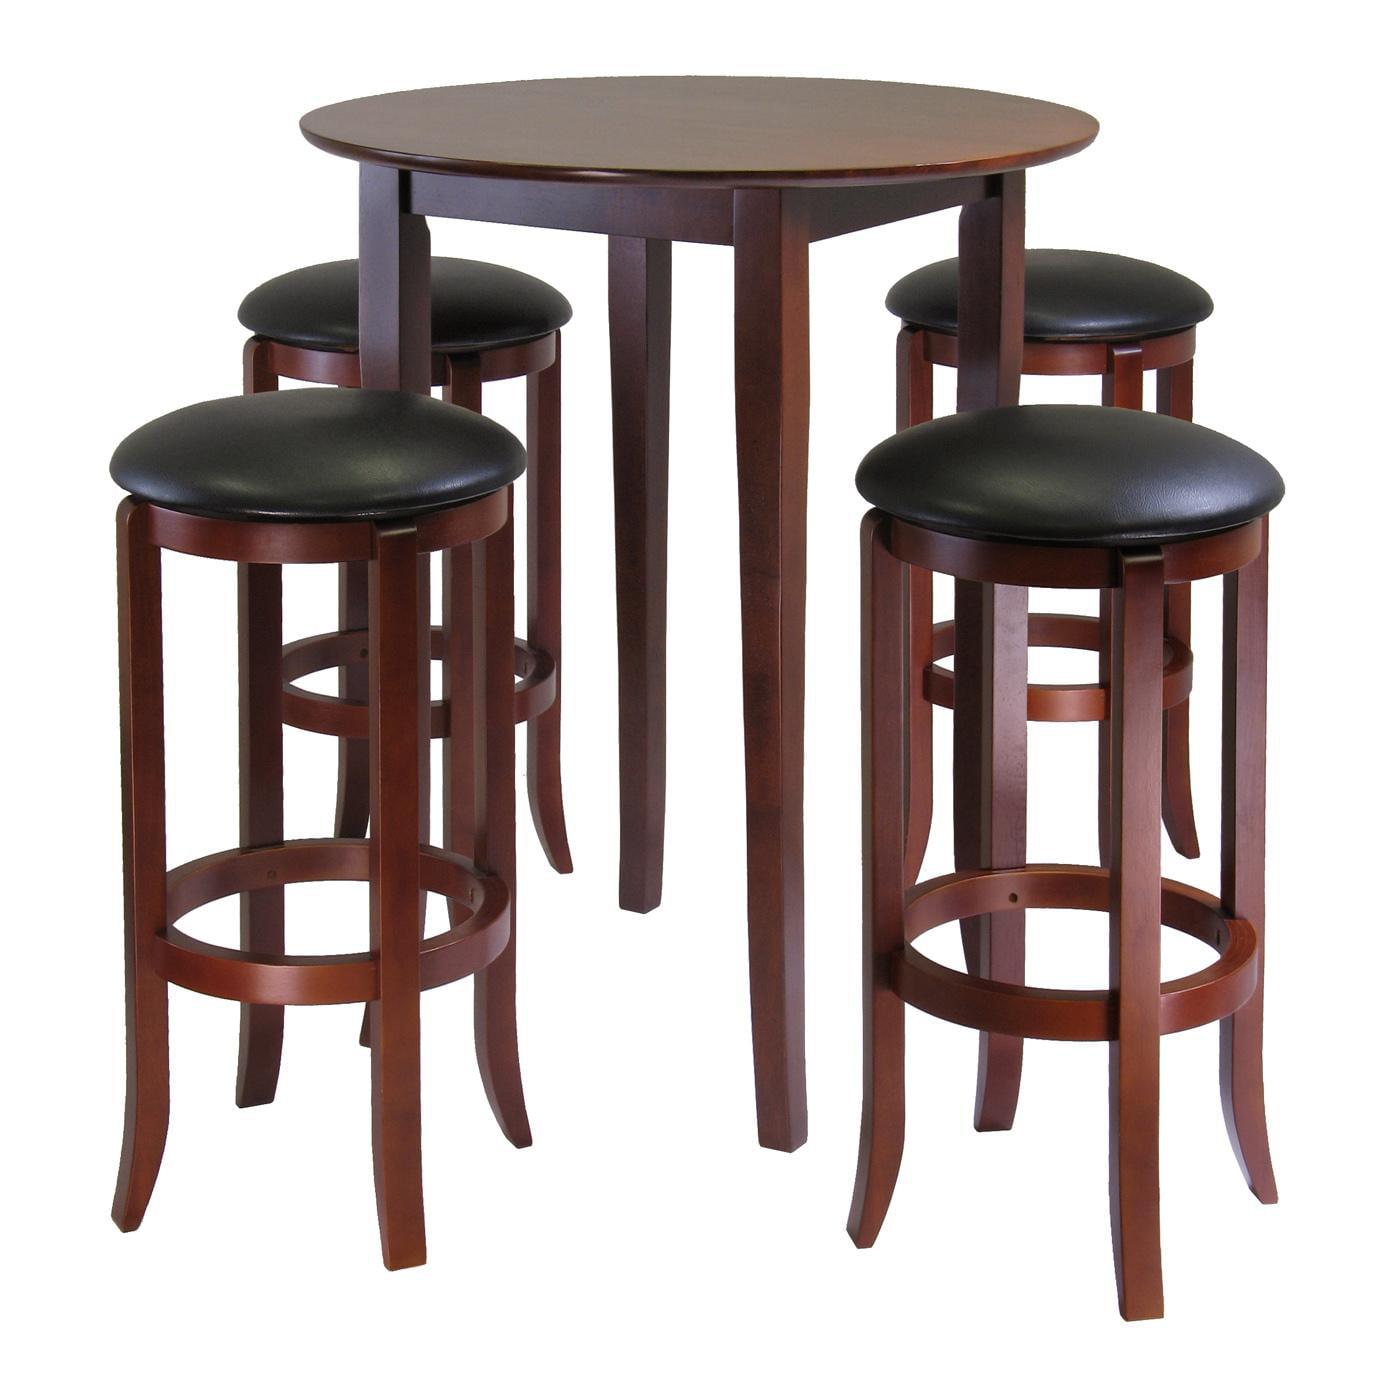 Winsome Fiona 5-Piece Round Pub High Table Set